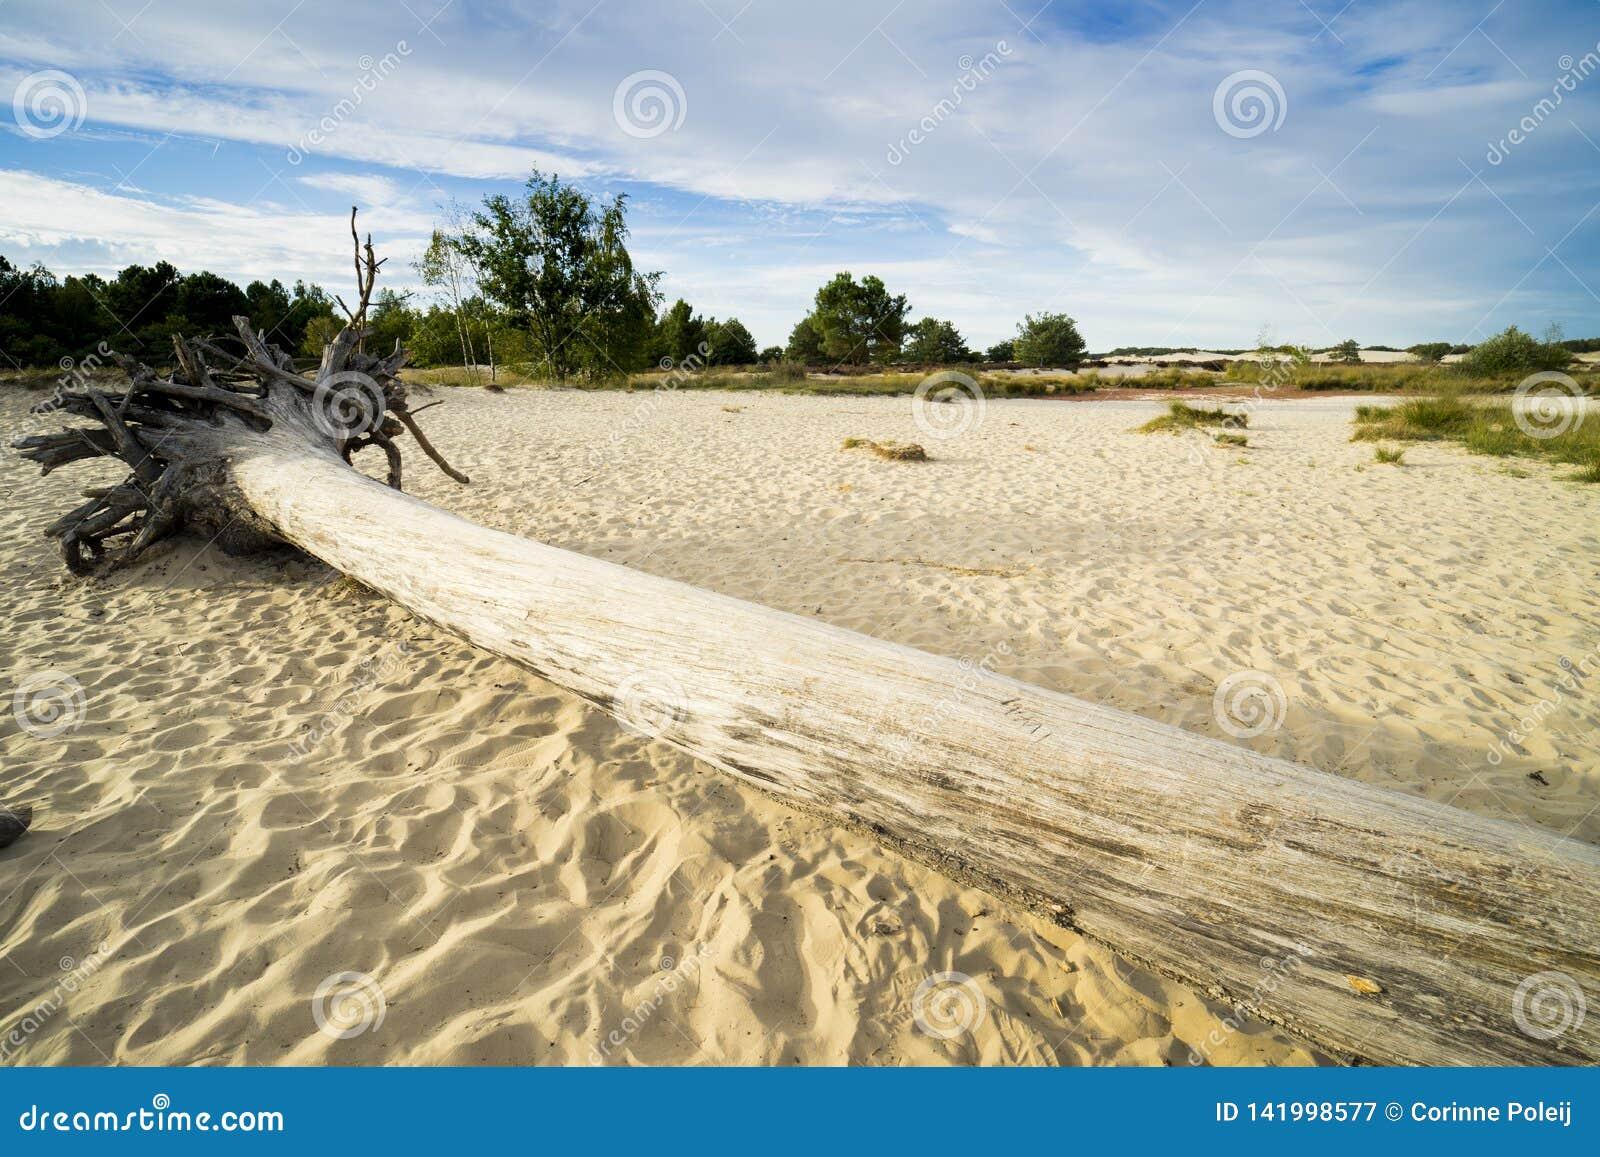 Grote boomboomstam in zand van nationaal park Loonse Engelse Drunense Duinen, Nederland